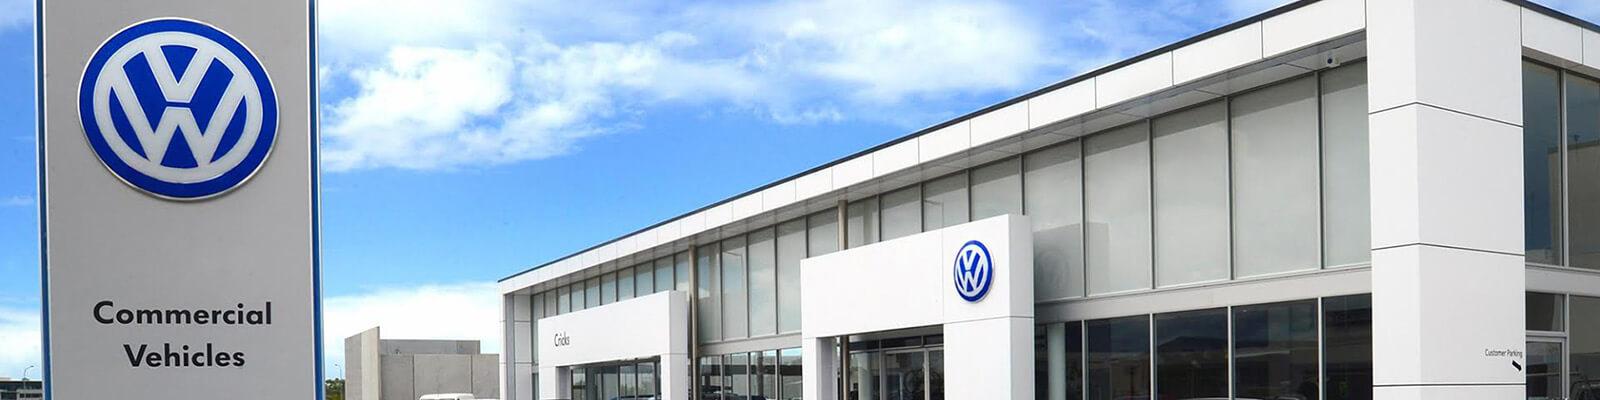 Cricks Maroochydore Volkswagen